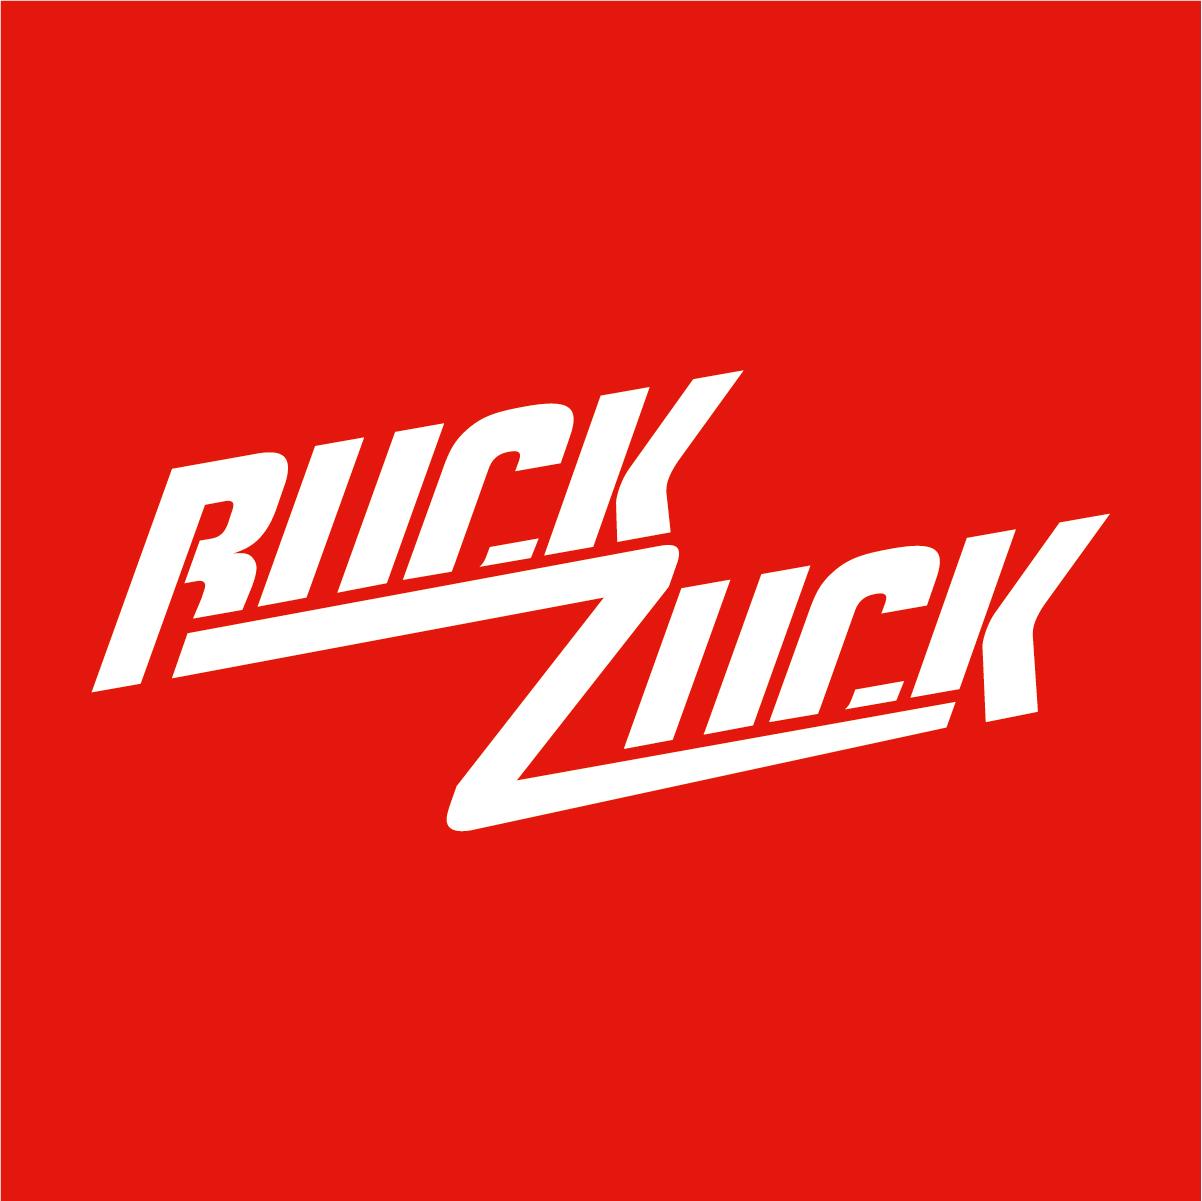 MUSTER CERAMIN VARIO 3mm Fliese x-tra breit+lang Ölschiefer PVC-frei